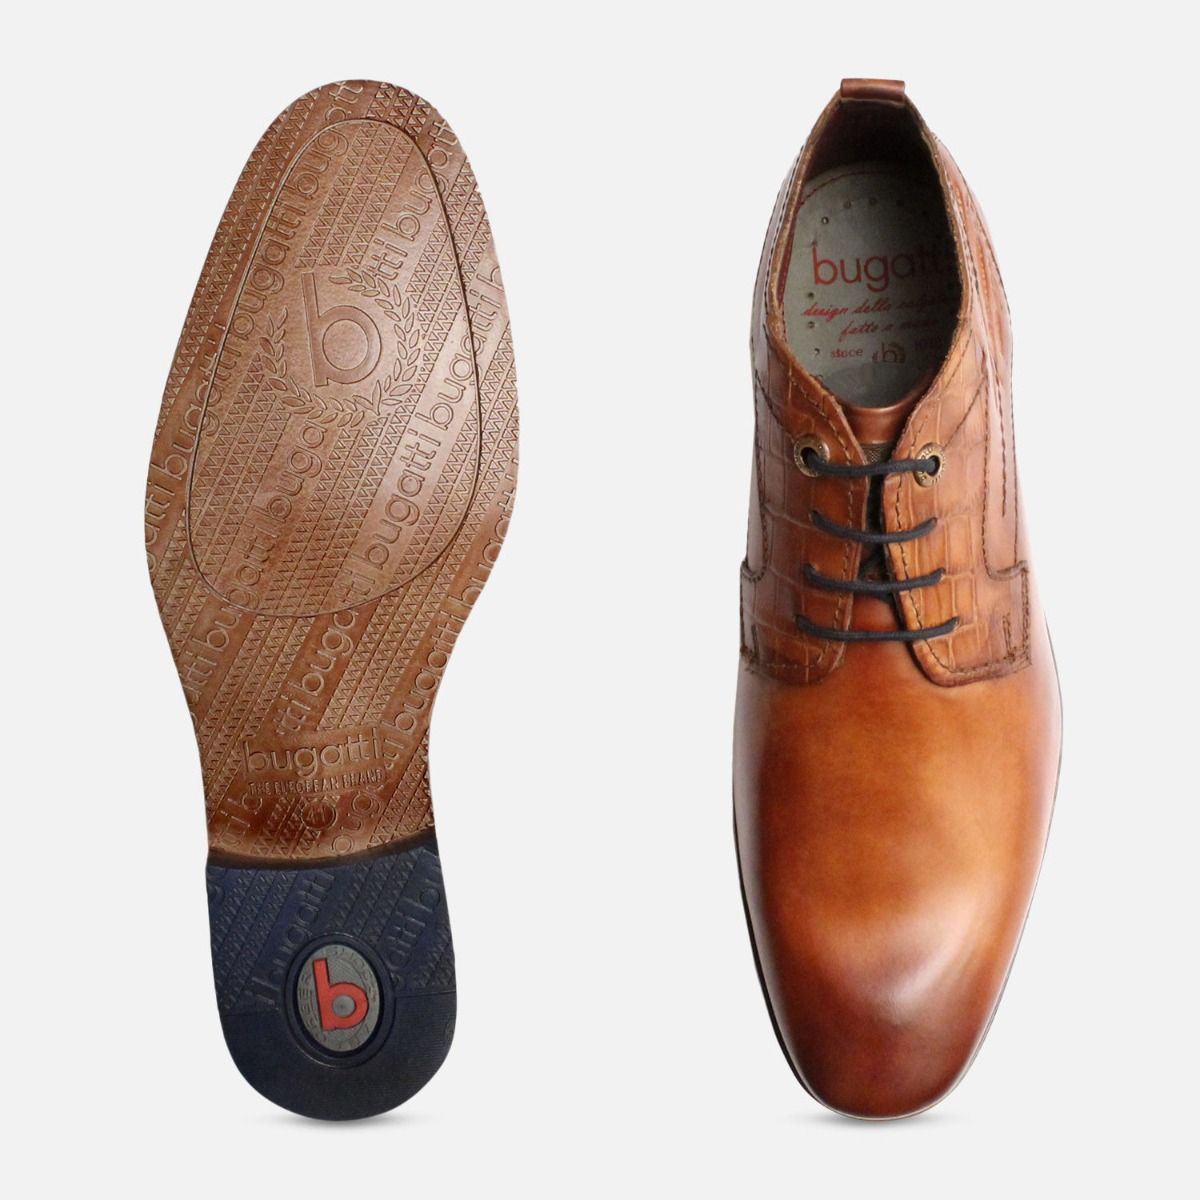 Cognac Tan Low Cut Lace Up Boots by Bugatti